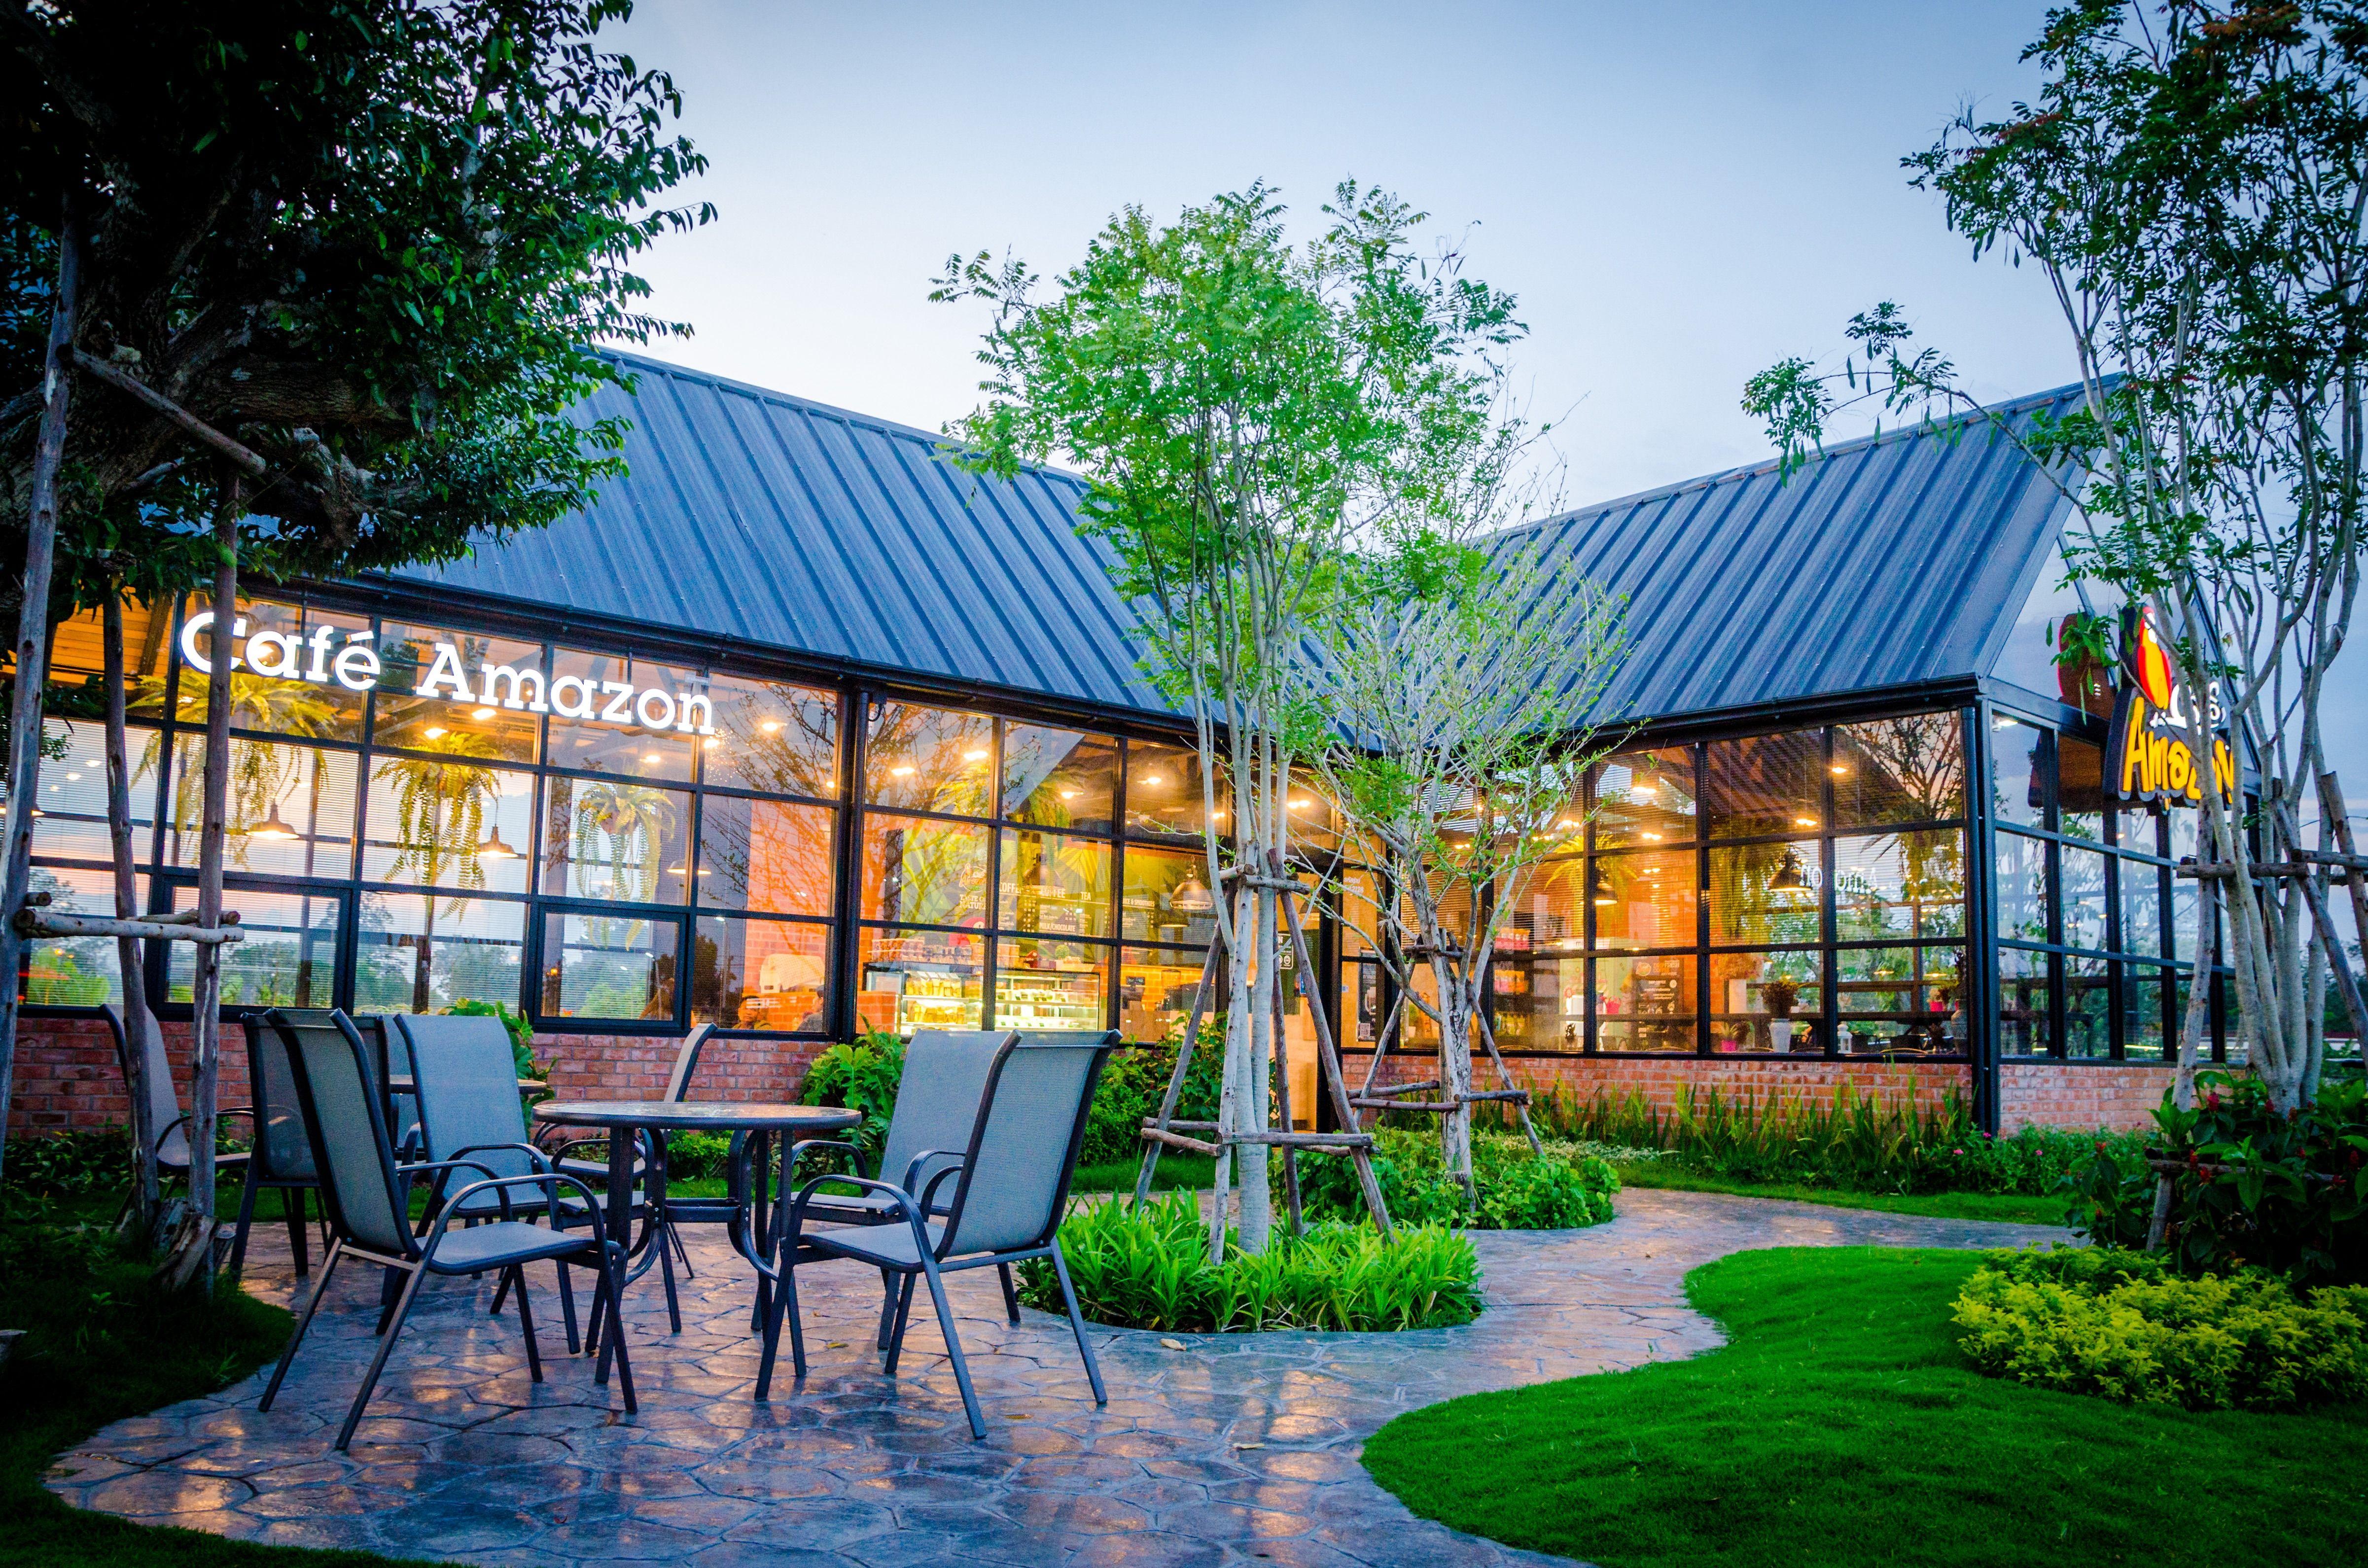 Cafe Amazon Greenscape Outdoor Decor Architecture Design Outdoor